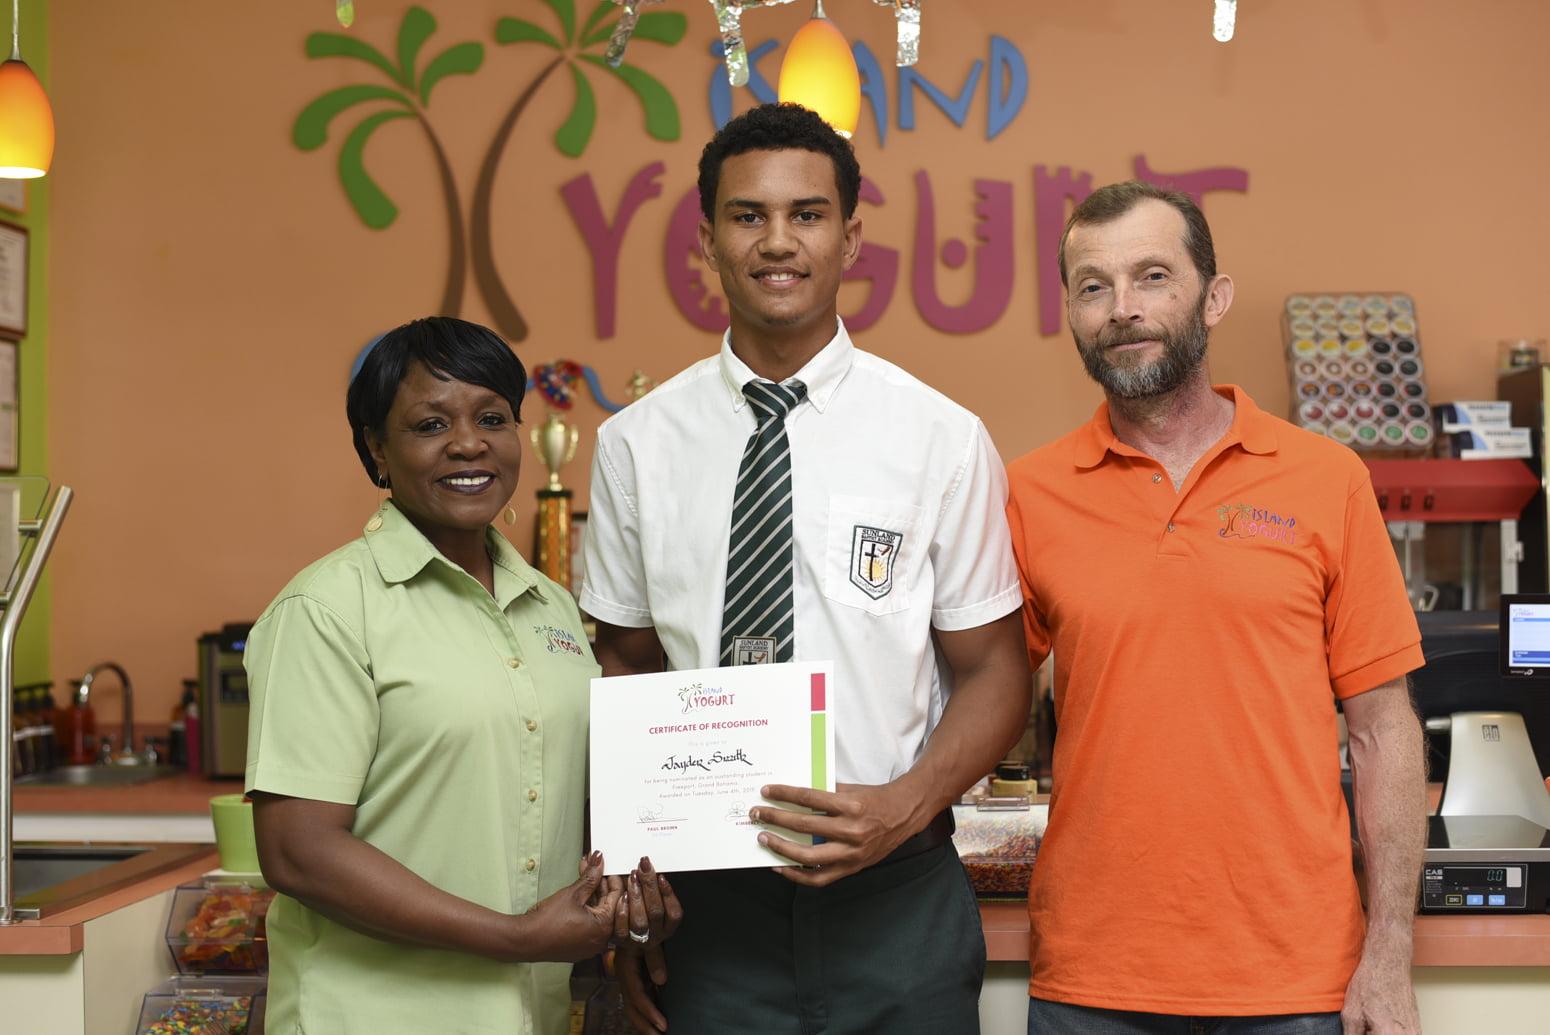 Island Yogurt hosts student recognition event